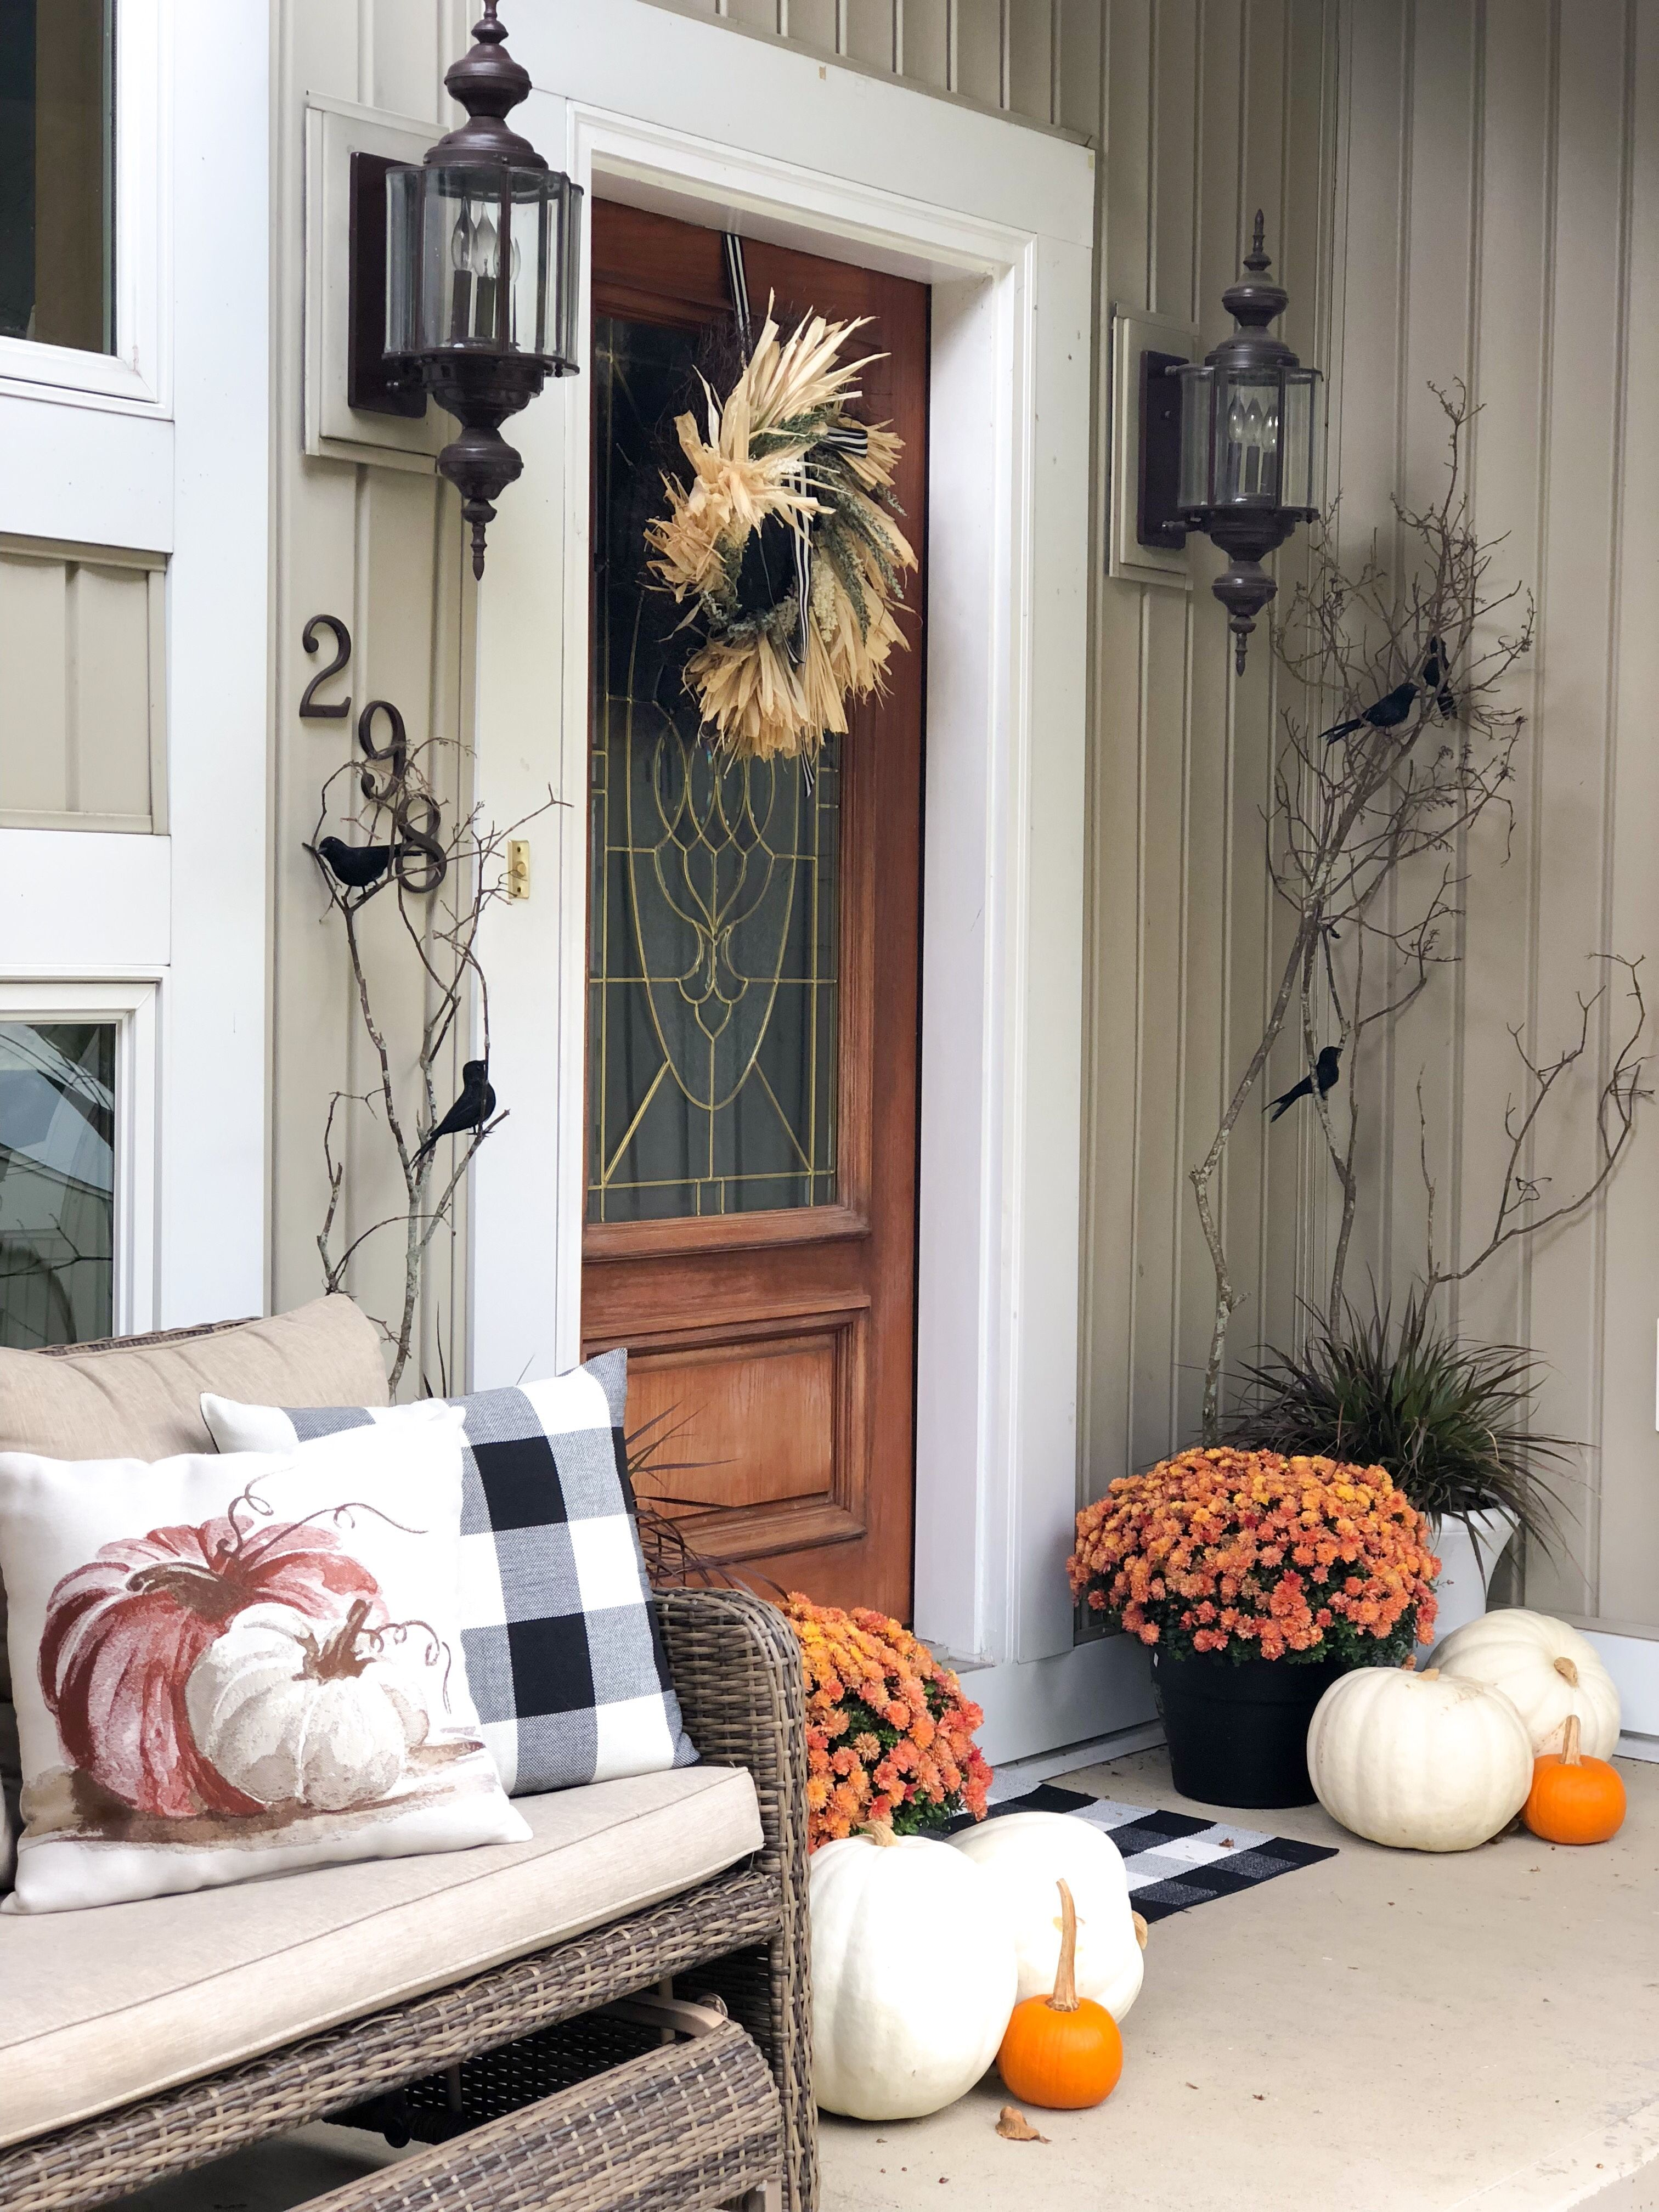 Elegant and Sophisticated Halloween Decor • 29 Design Studio